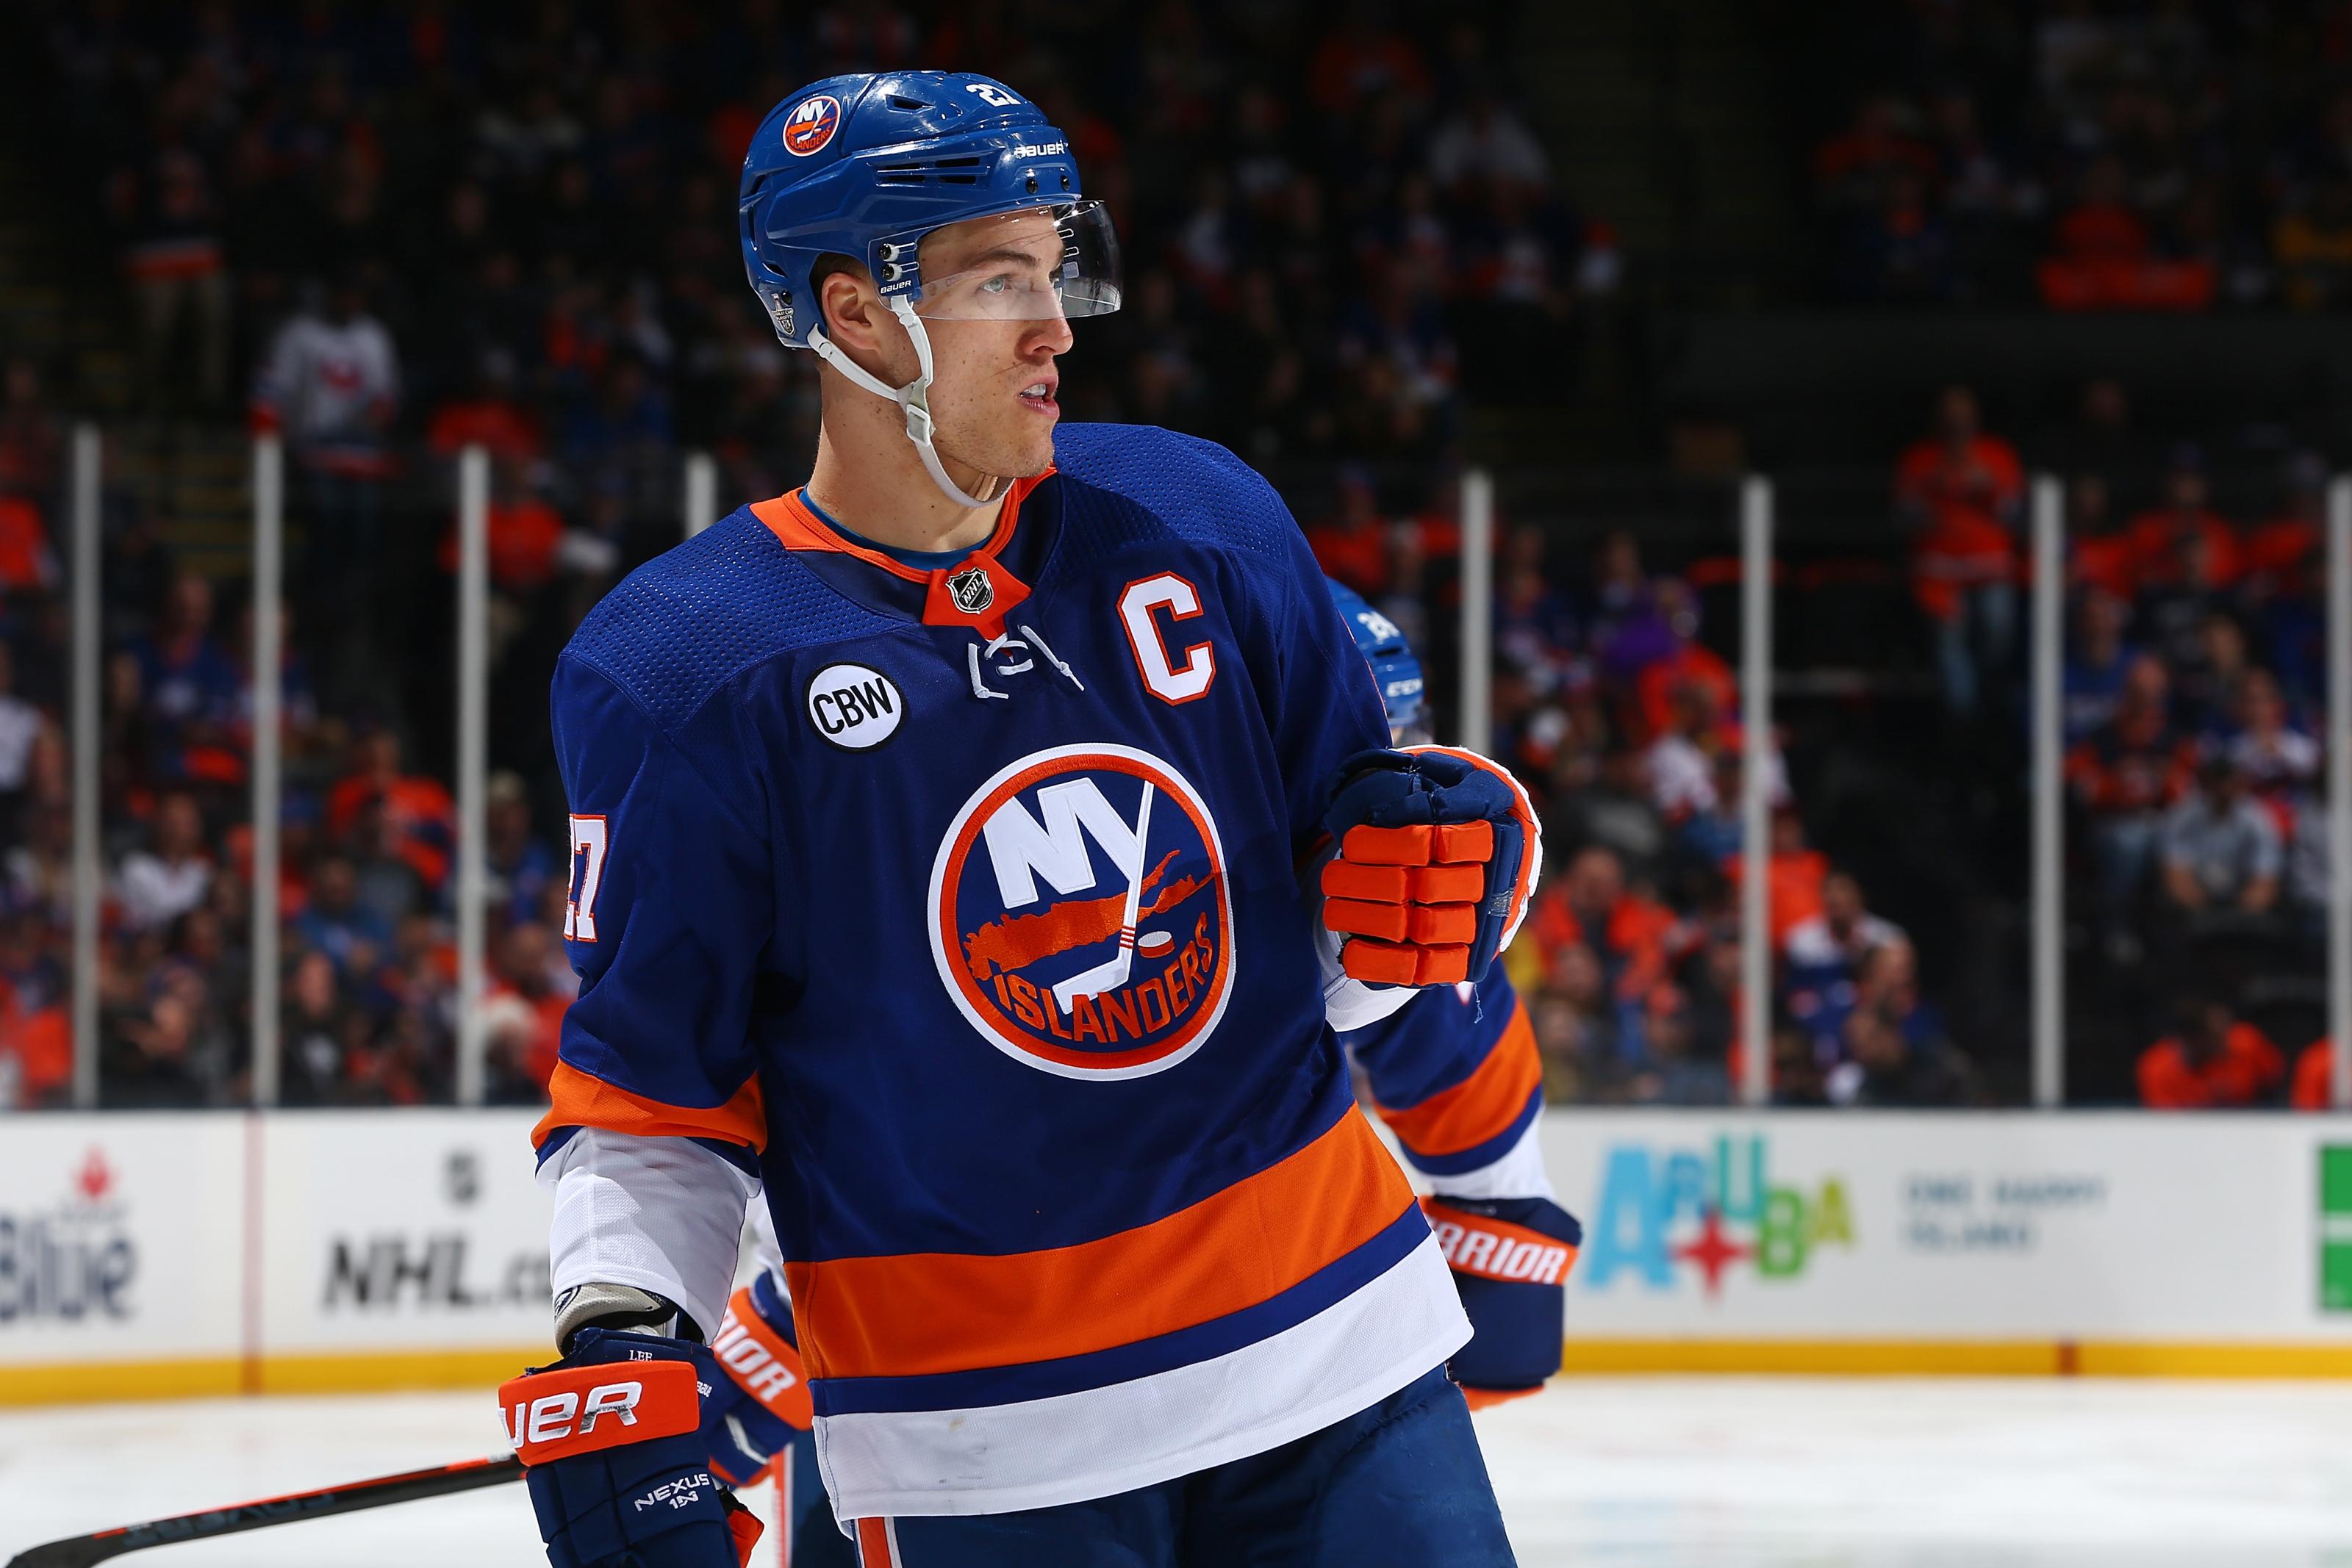 Anders Lee New York Islanders Player Swingman Jersey